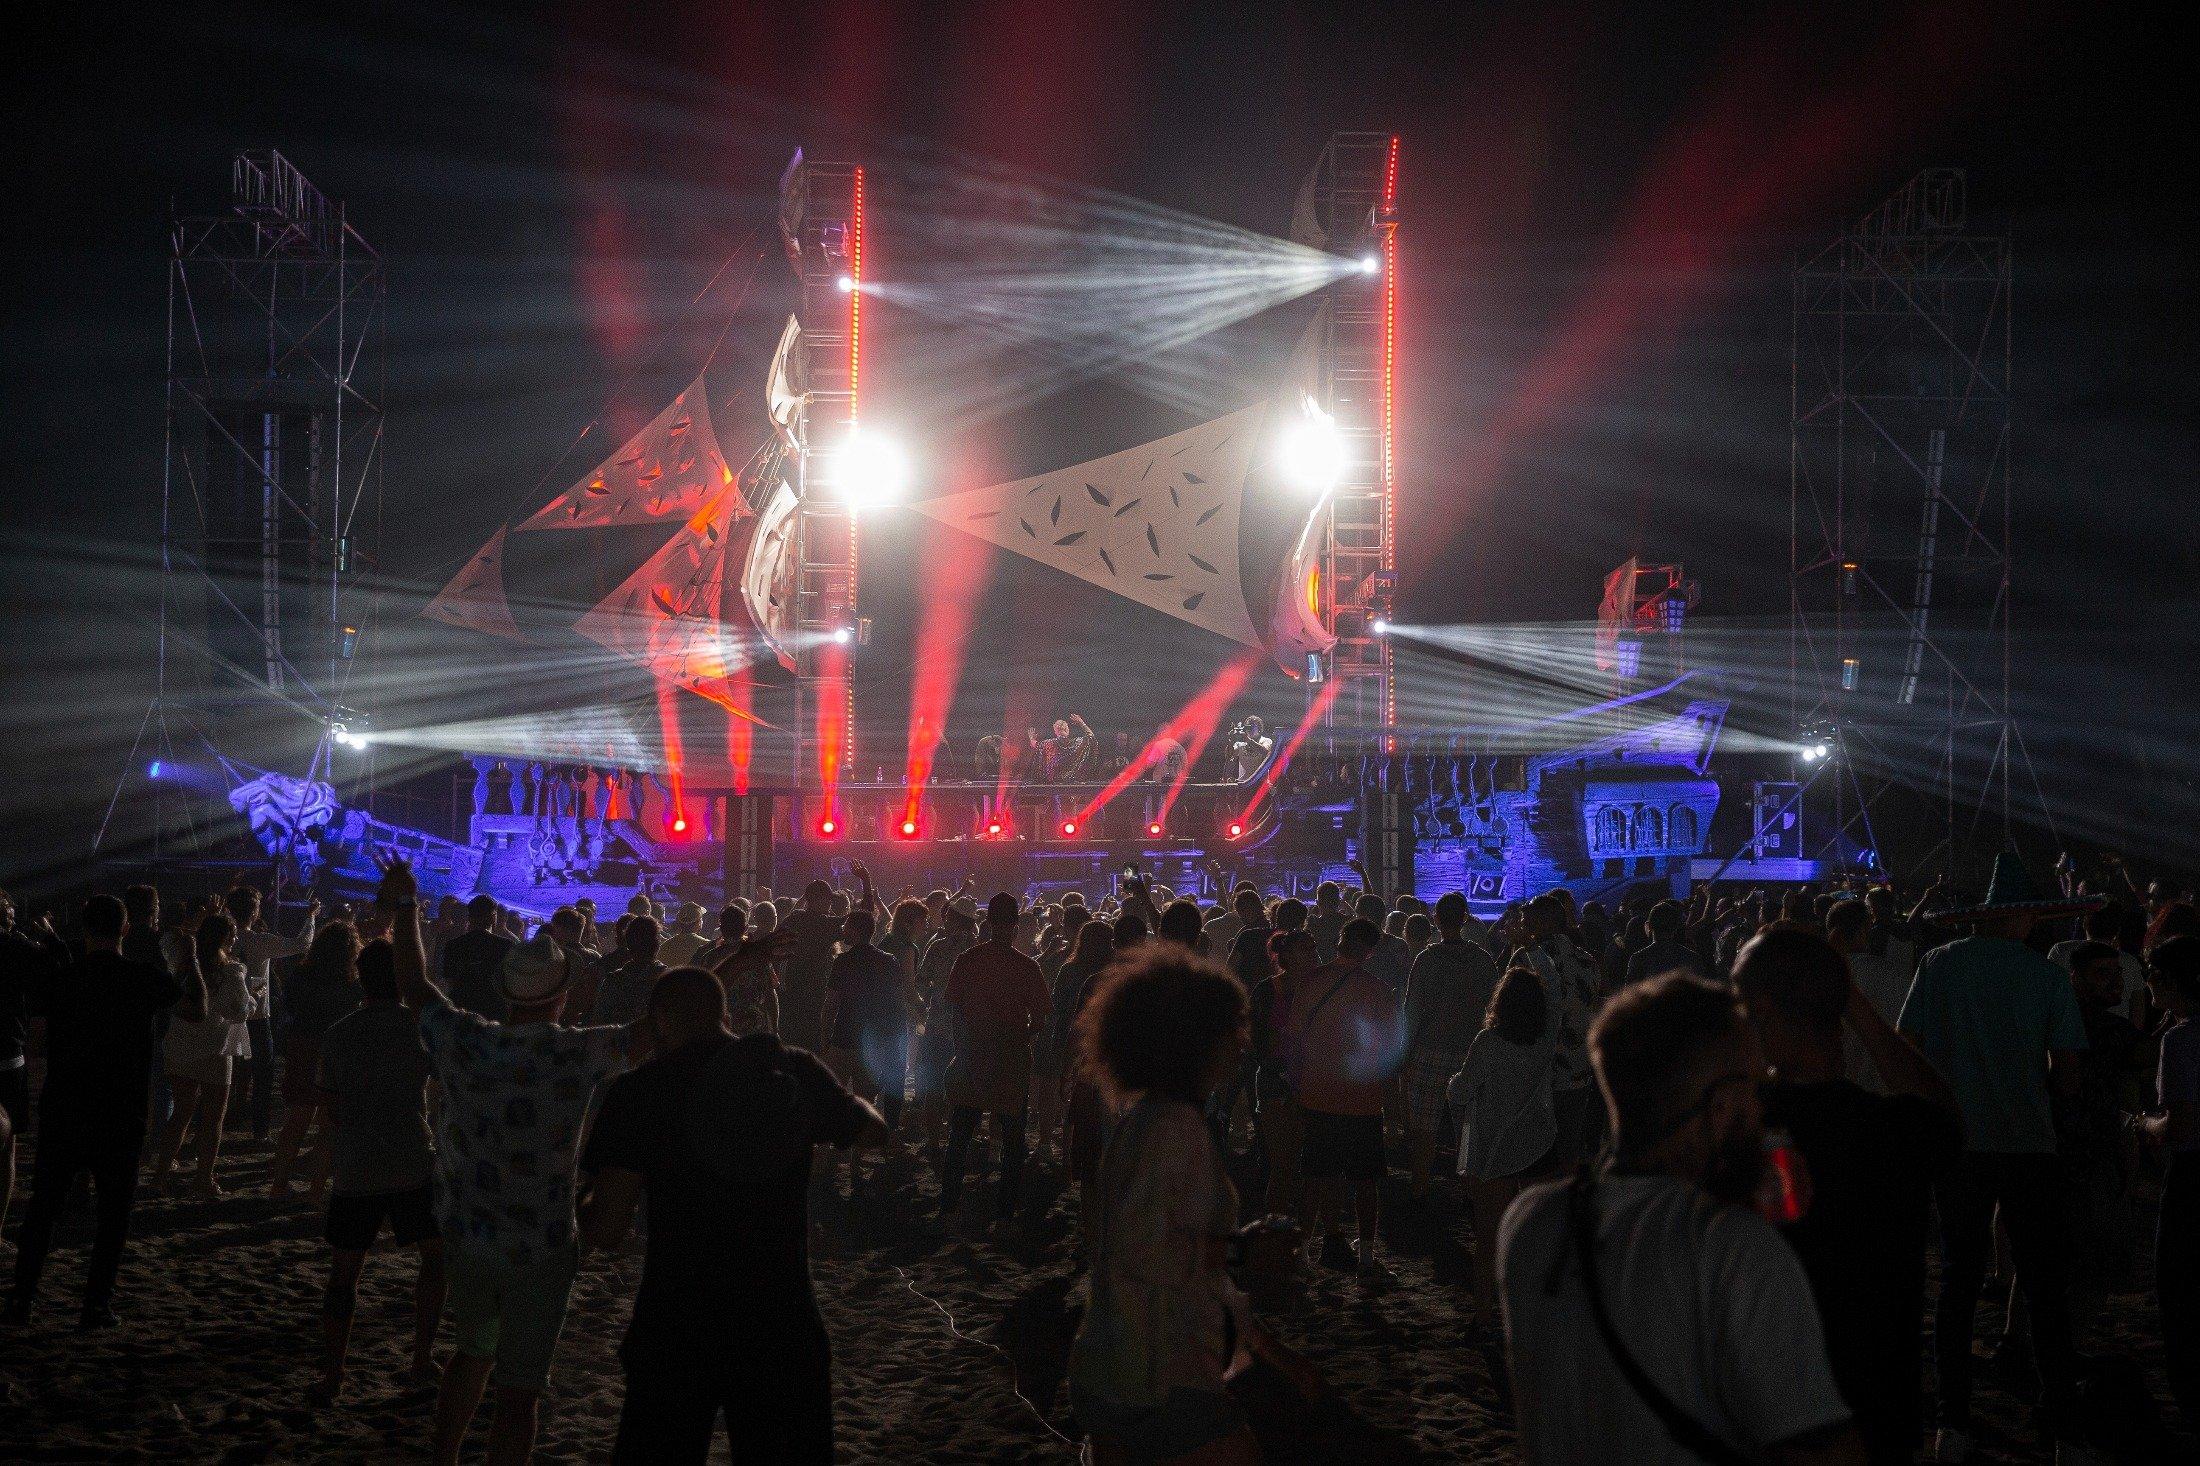 Thousands of virus-free international fans participate at Unum Albania's open-air music festival in Shengjin, Albania, June 4, 2021. (AP Photo)